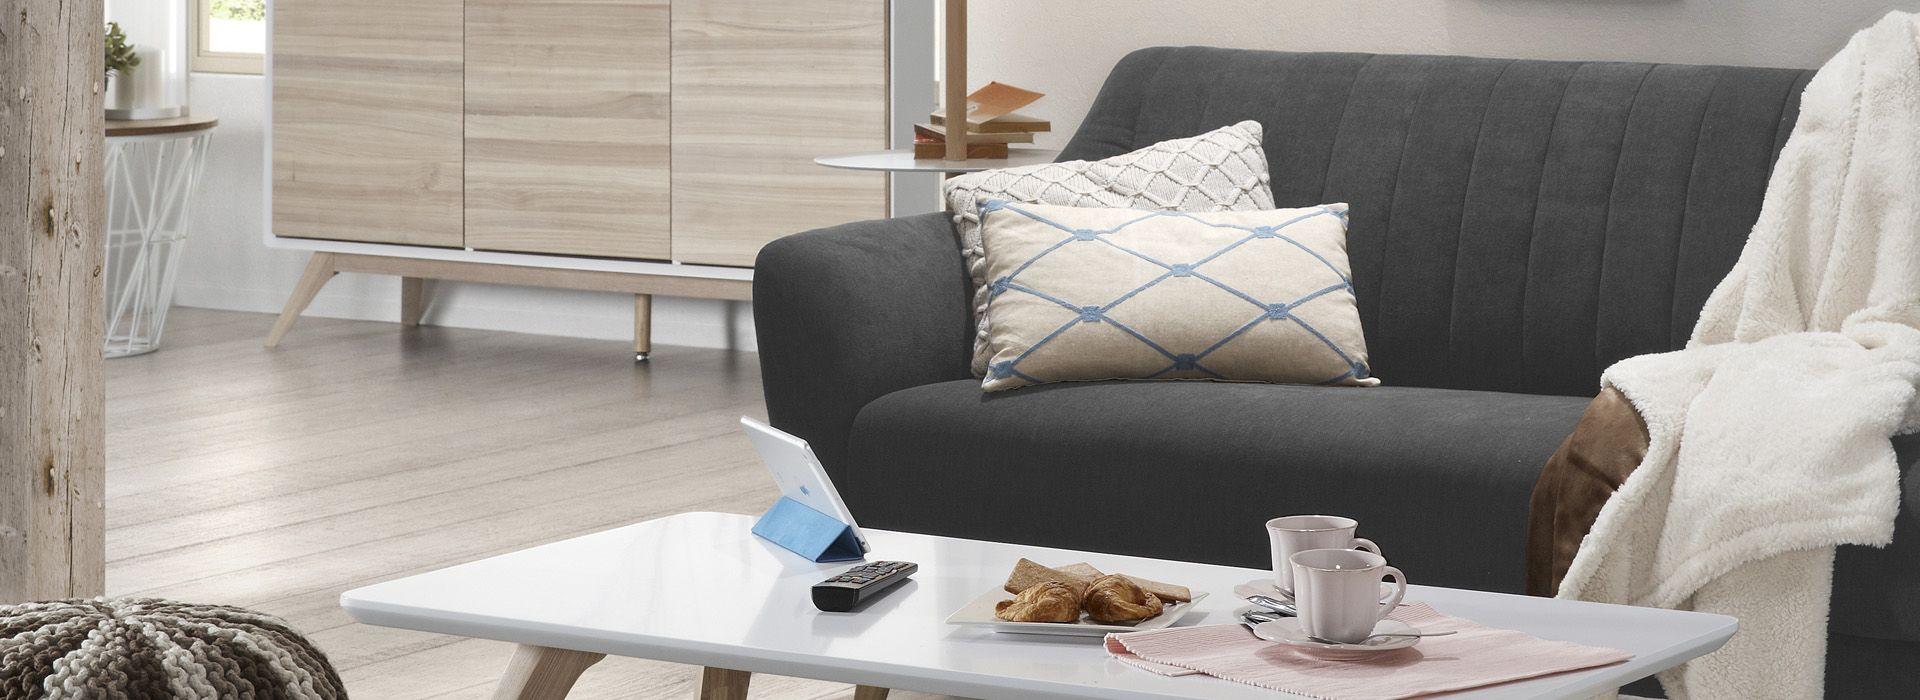 Sofa economicos tapiceros en alicante tapicerias for Sofas baratos alicante